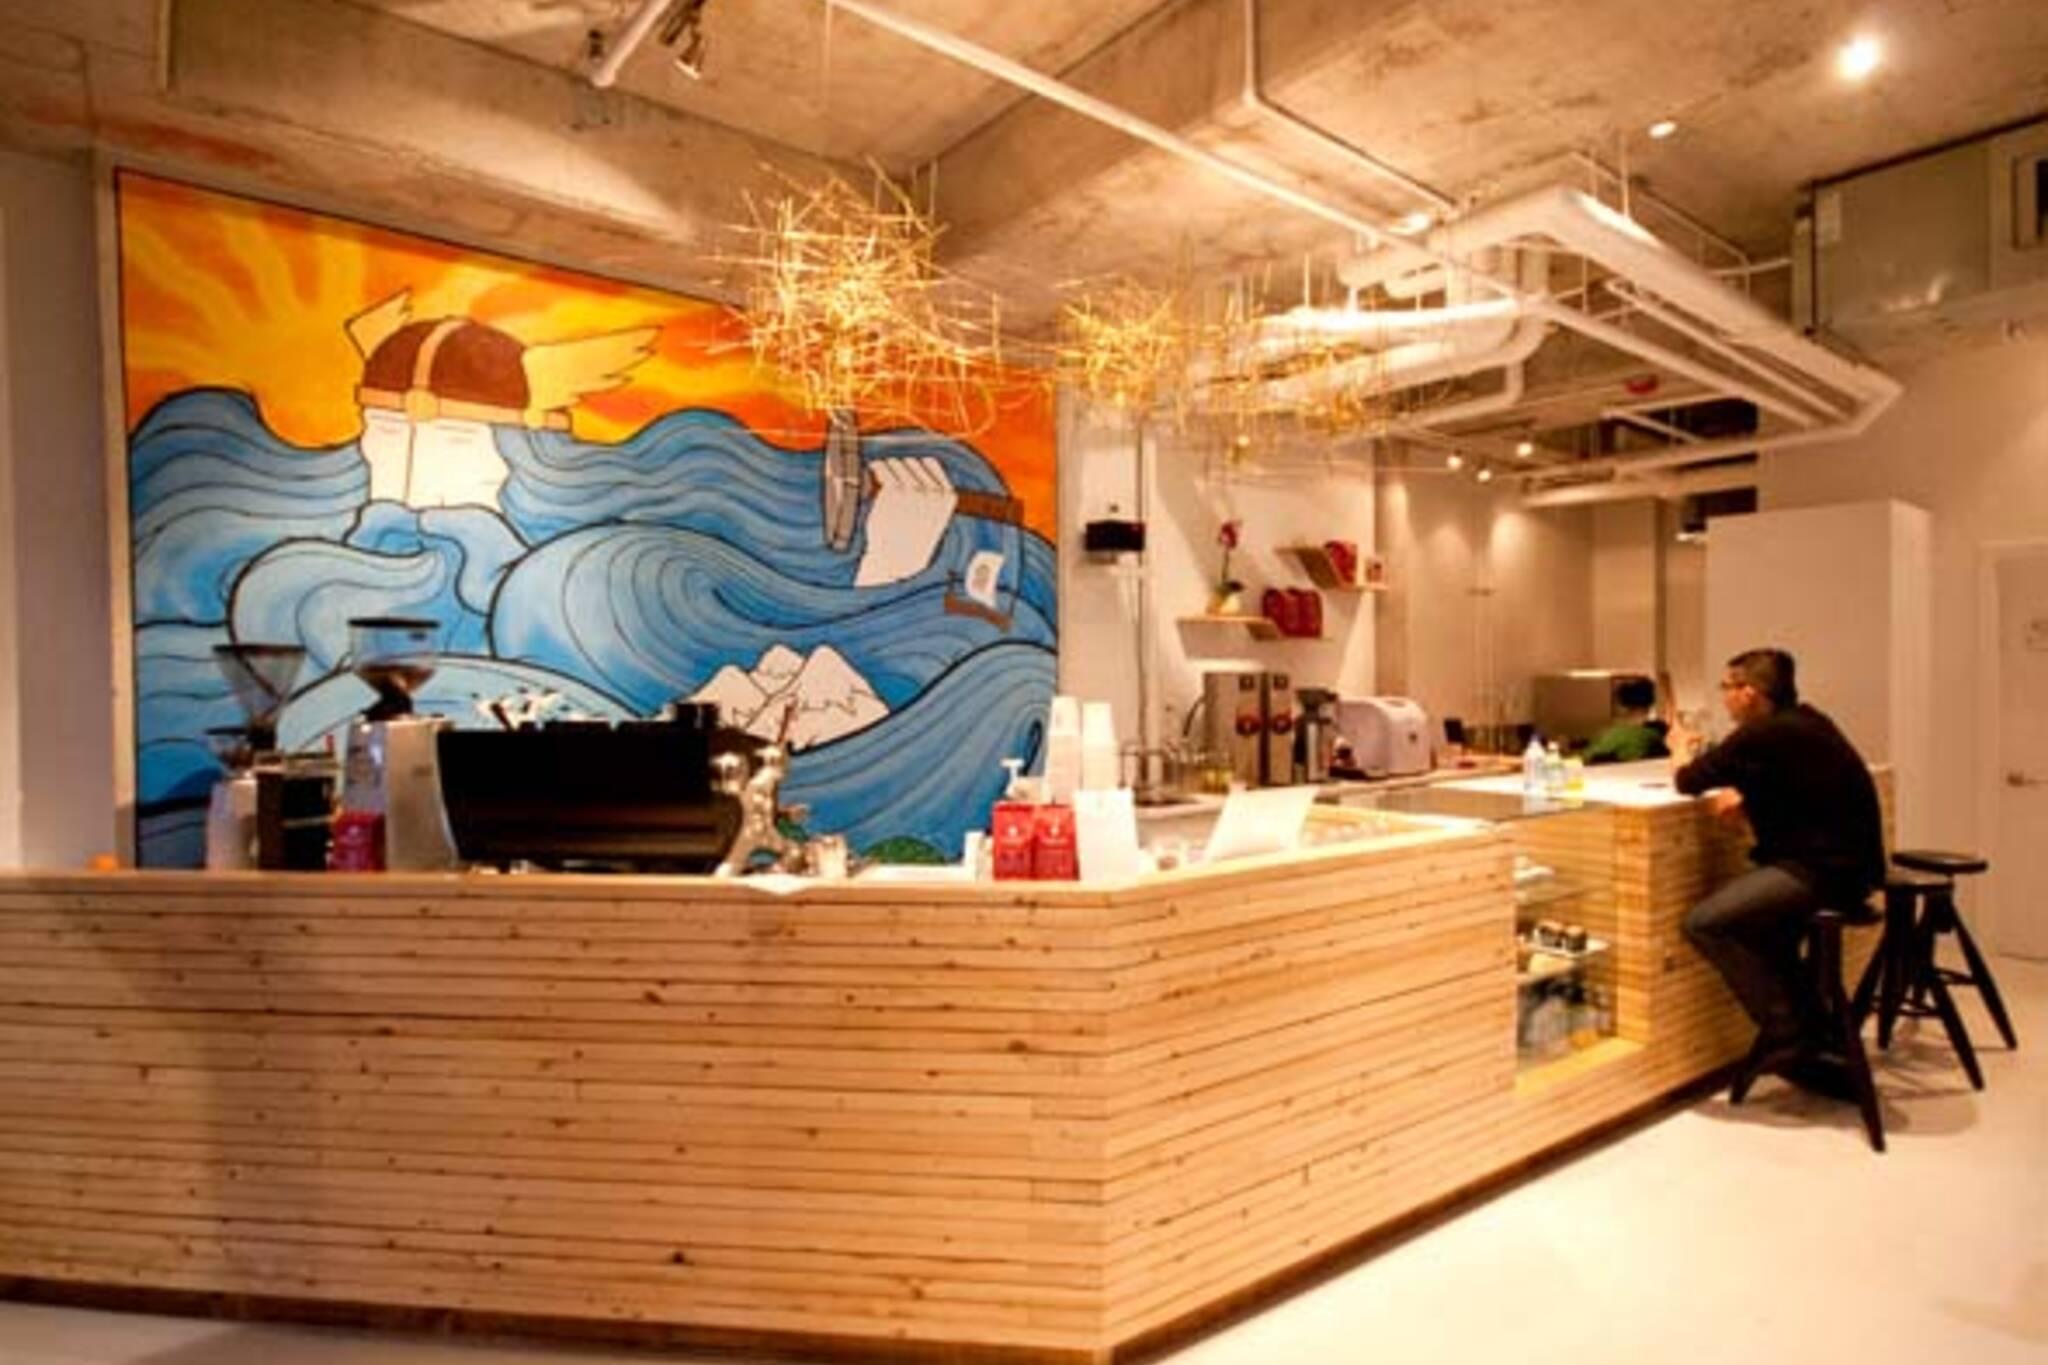 Bathurst cafe